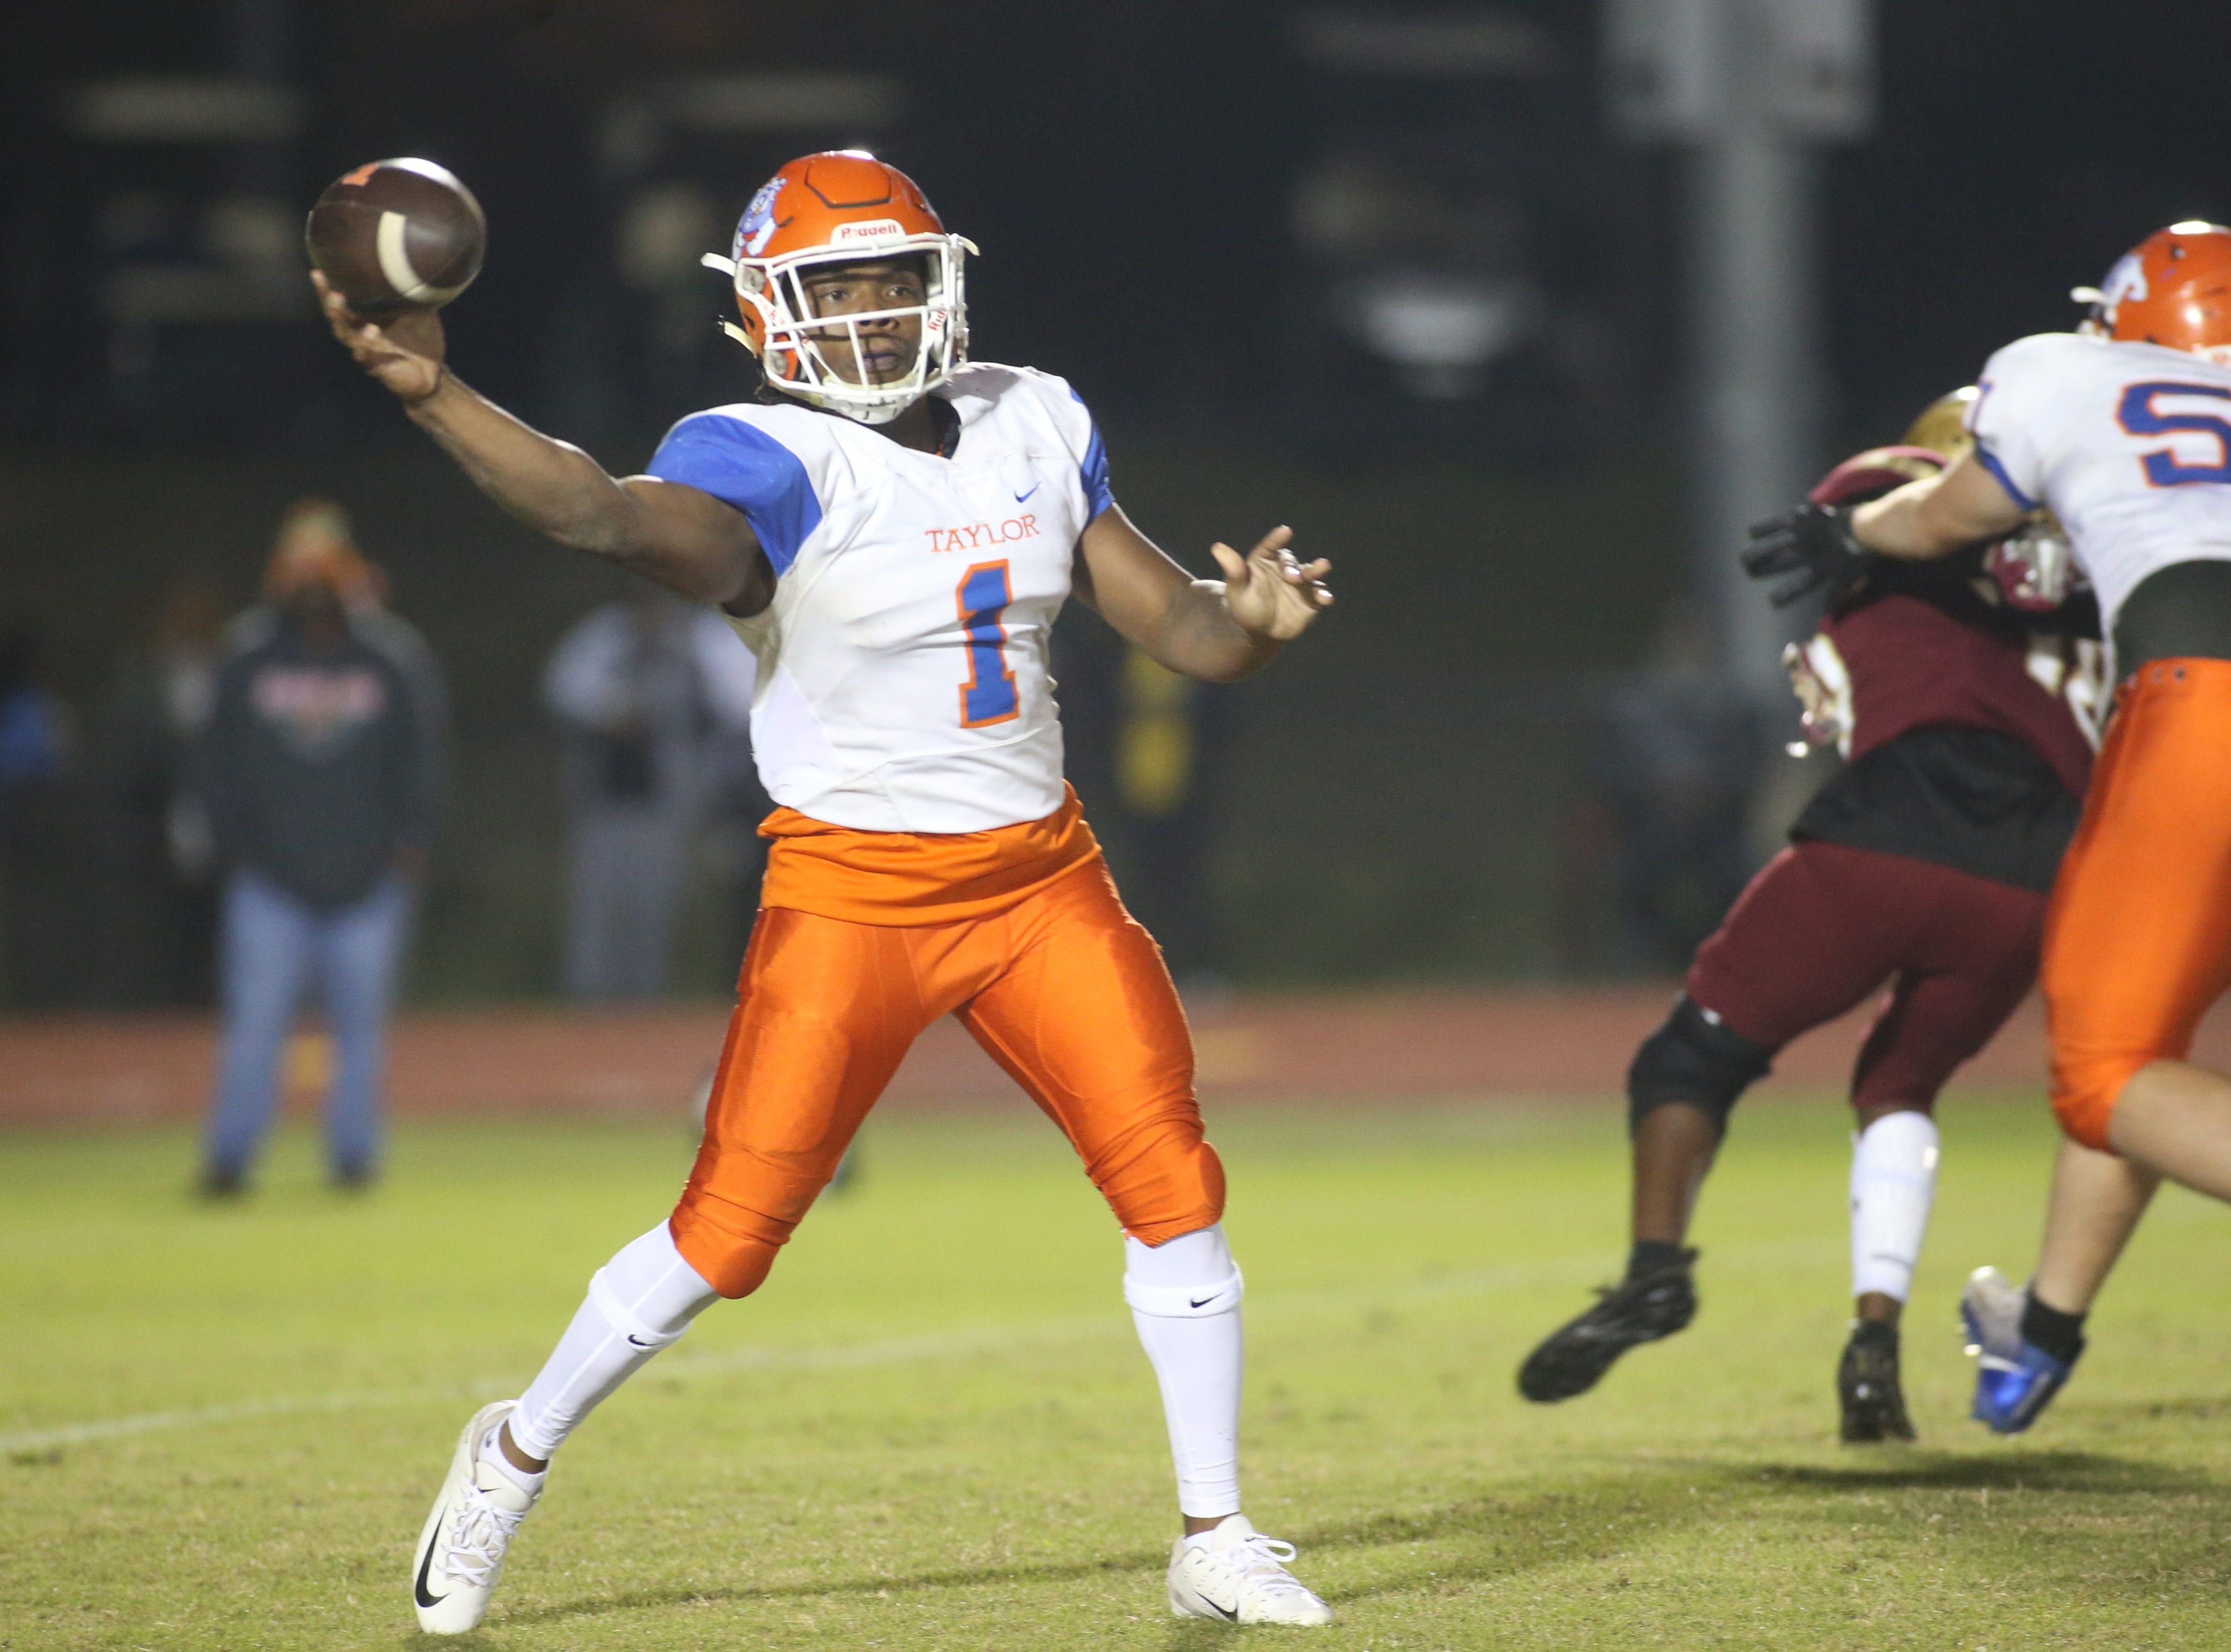 Taylor County Bulldog quarterback Da'corian Bellamy (1) passes to a teammate as the Taylor County Bulldogs play the Florida High Seminoles in a Region 1-3A final on Friday, Nov. 23, 2018.